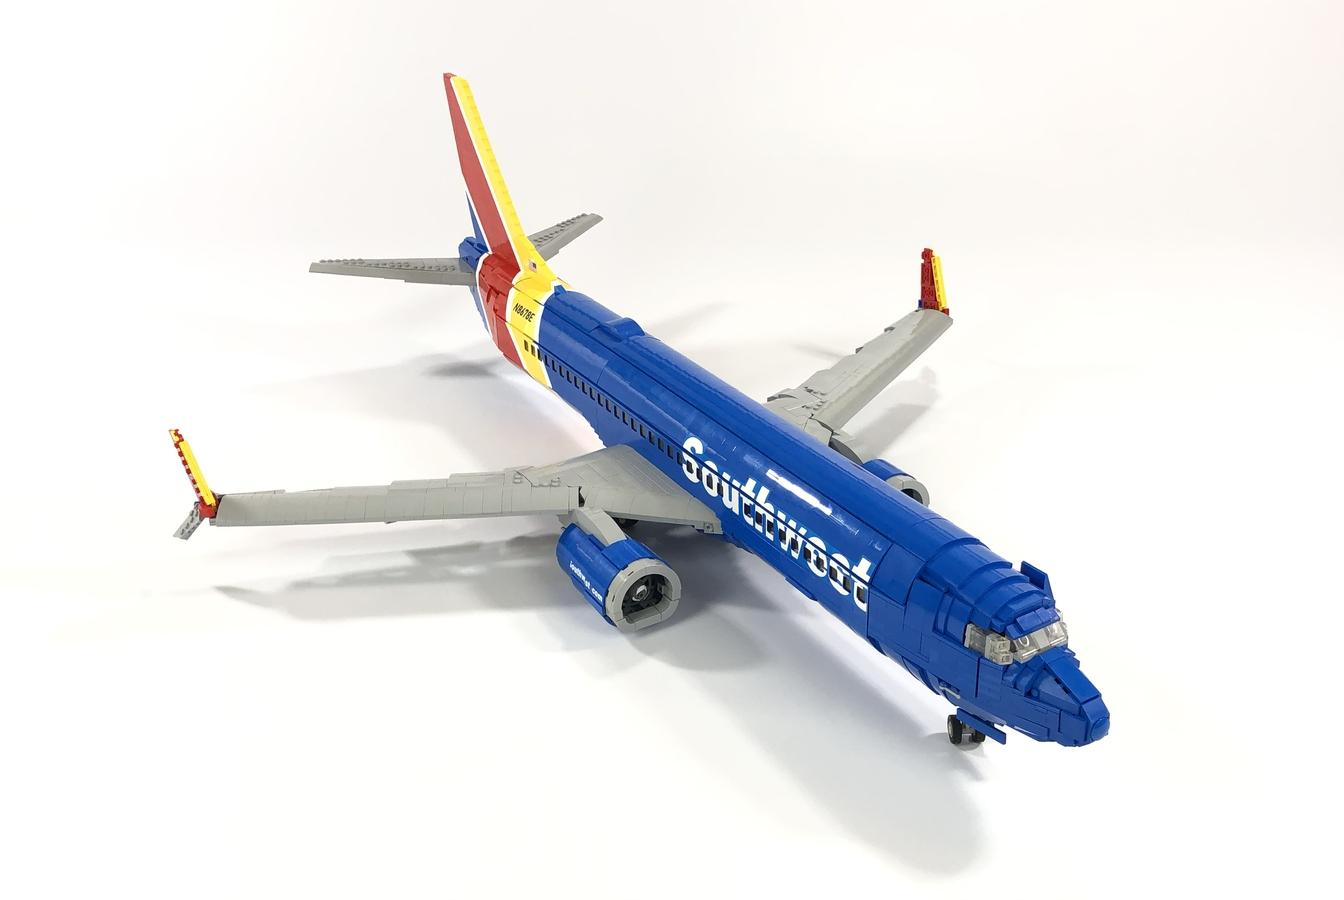 lego-ideas-southwest-737-800-bigplanes-customs-2 zusammengebaut.com